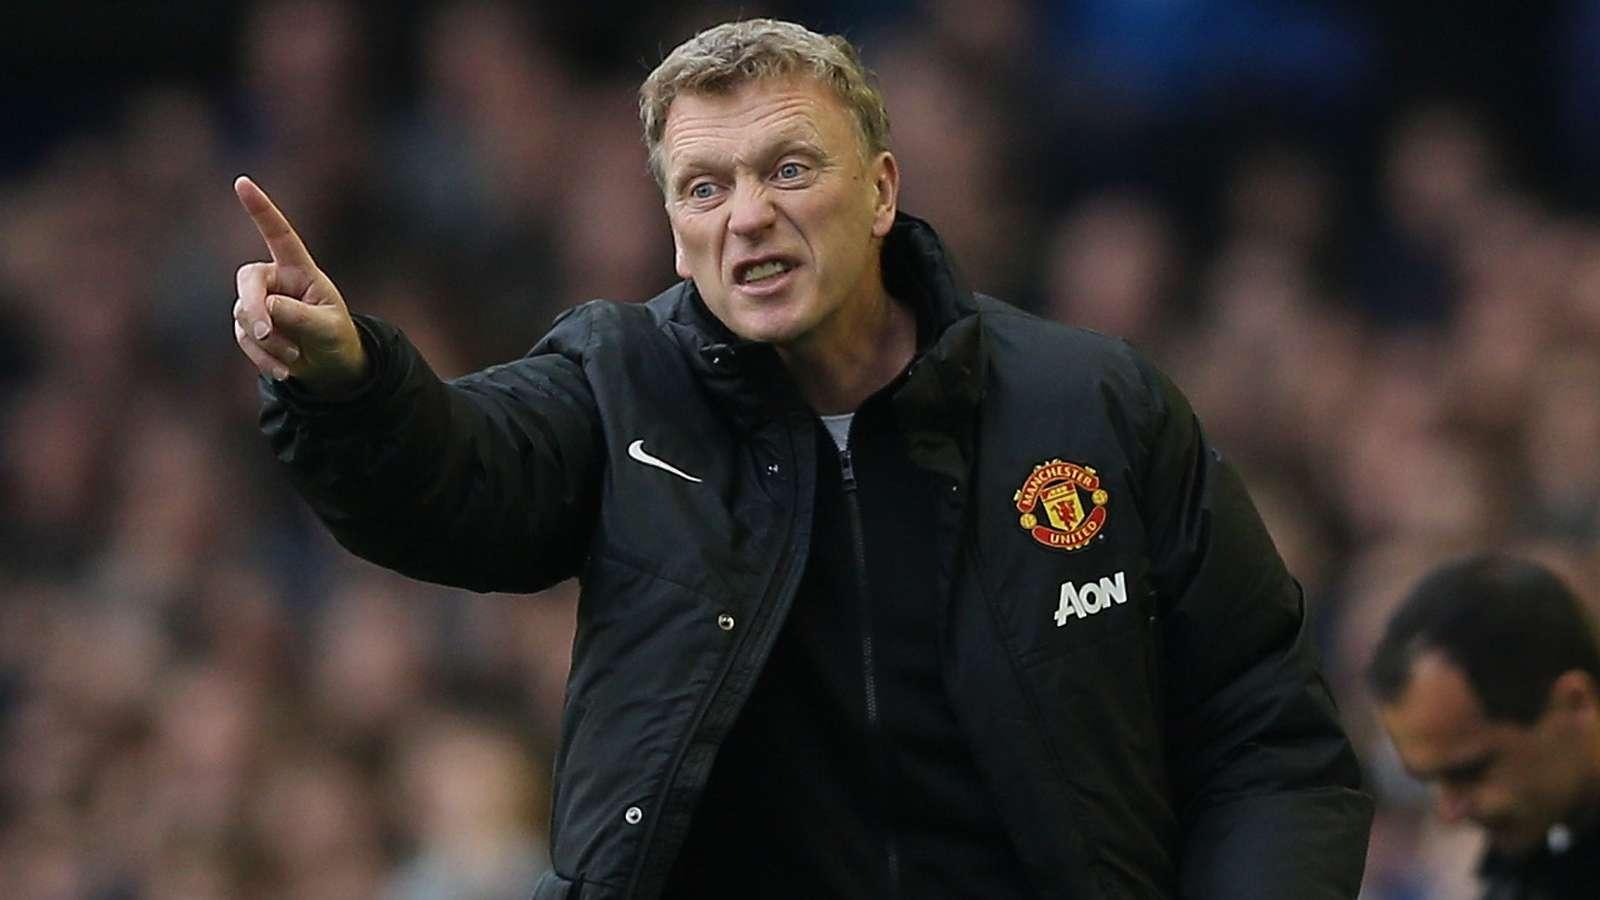 'Moyes a Man Utd mistake that is still haunting them!' – Chicharito - Bóng Đá